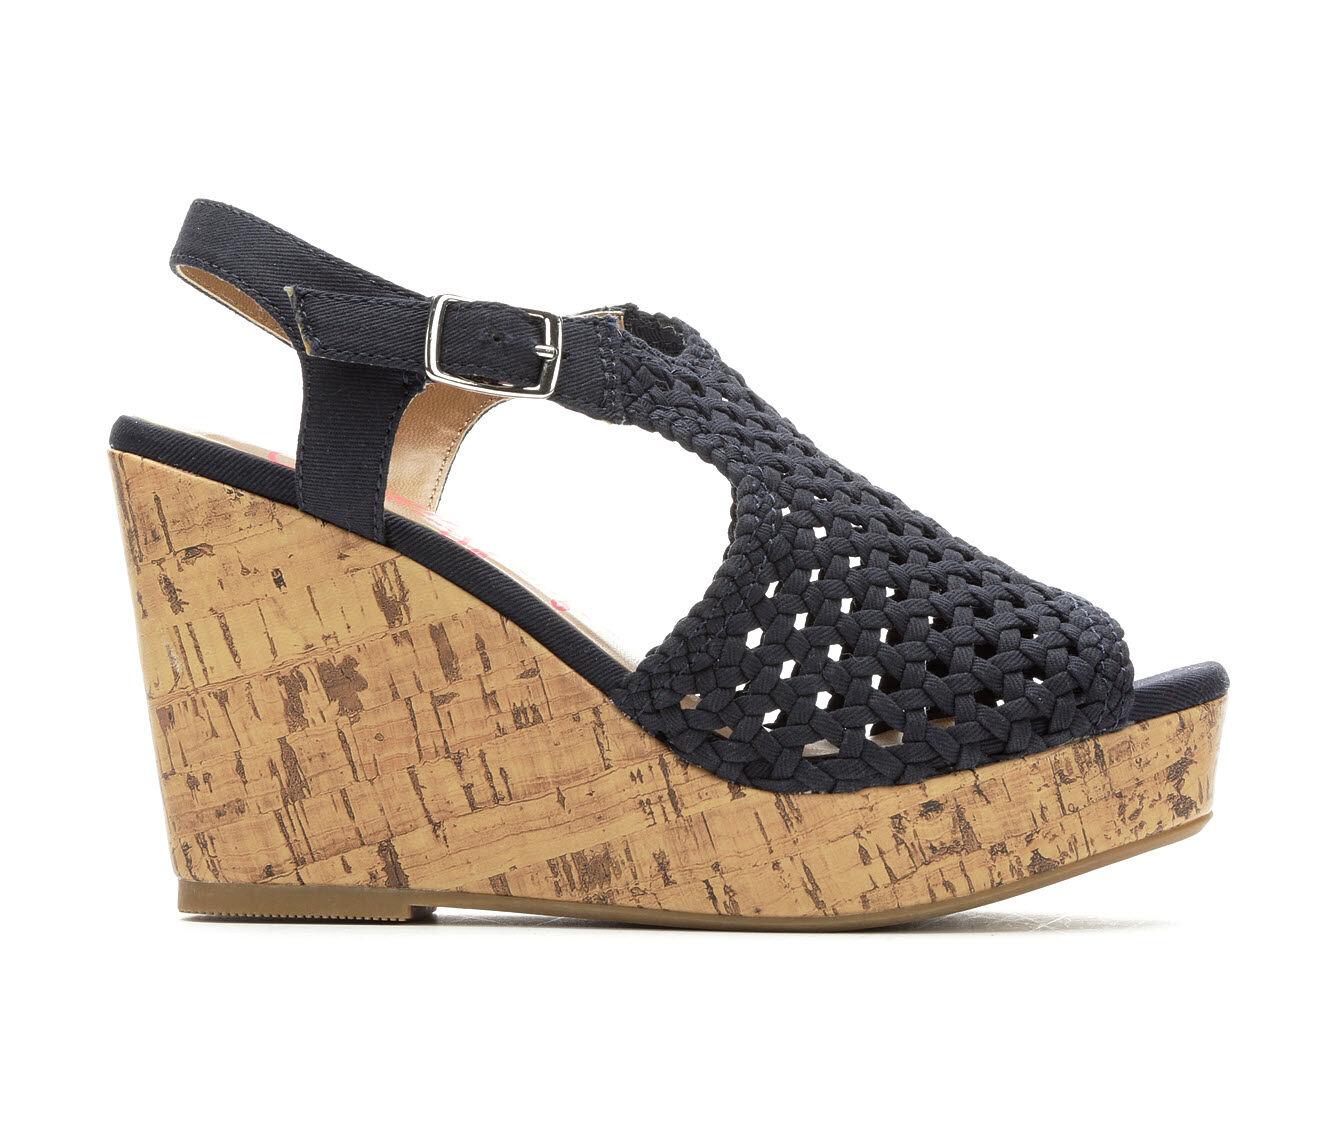 uk shoes_kd7395